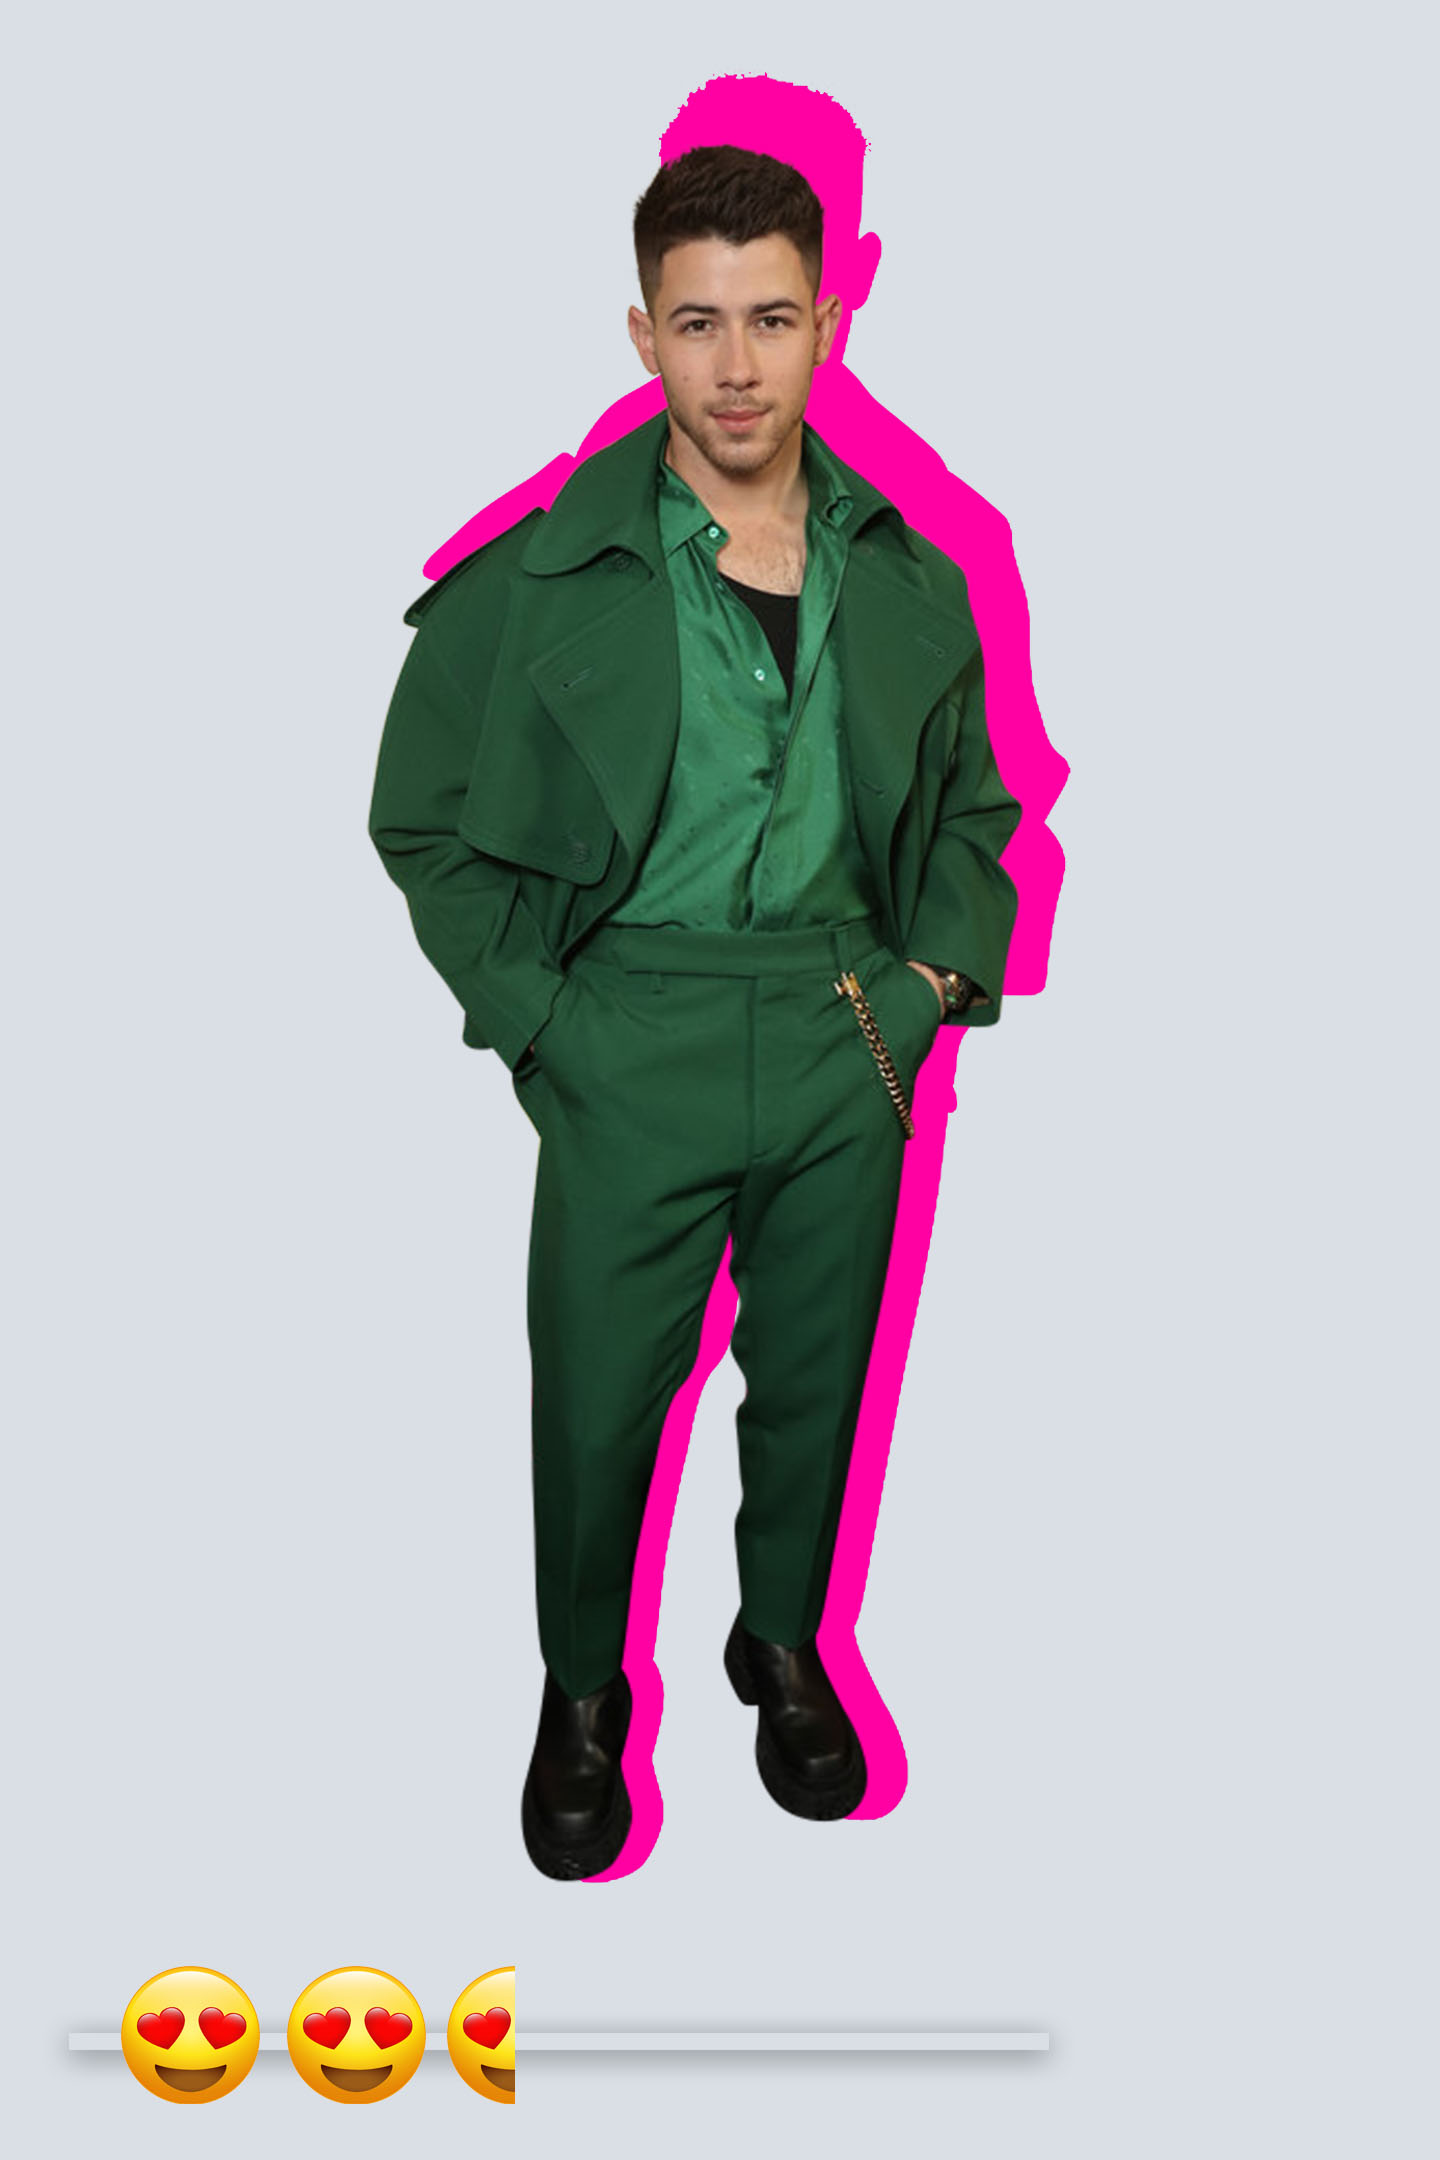 Nick Jonas at the Billboard Music Awards.